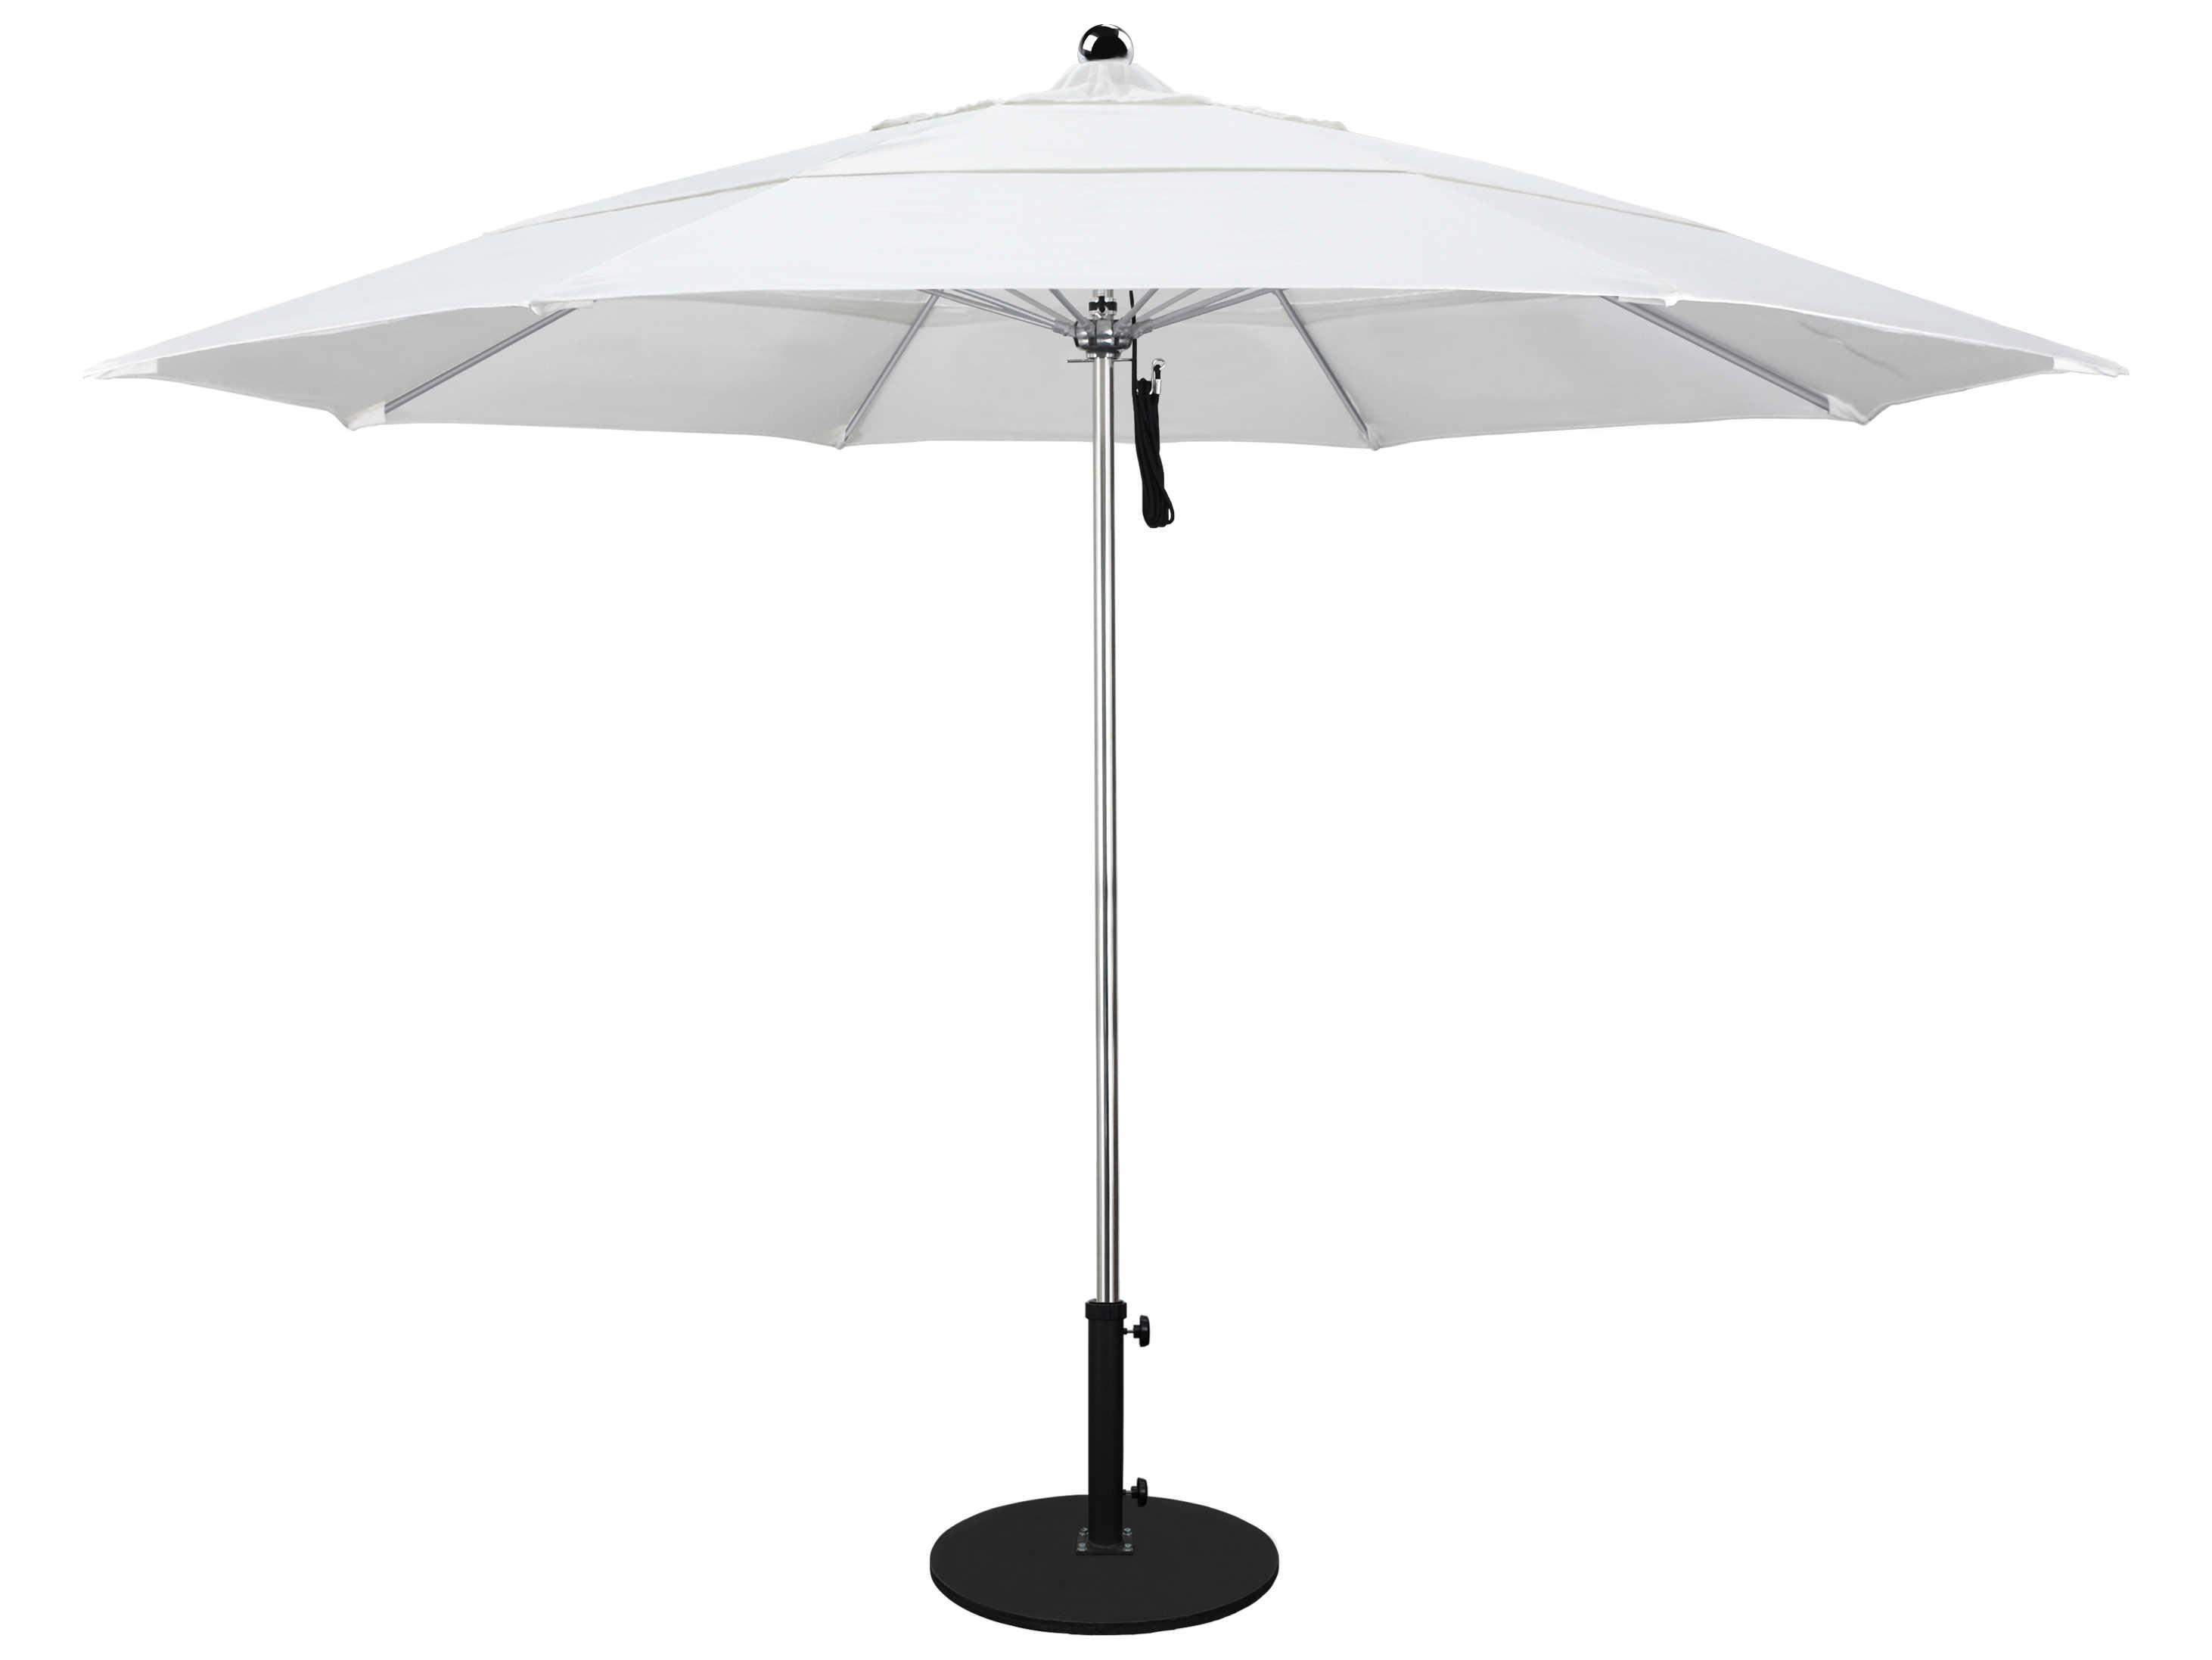 California Umbrella Allure Series 11 Foot Octagon Market